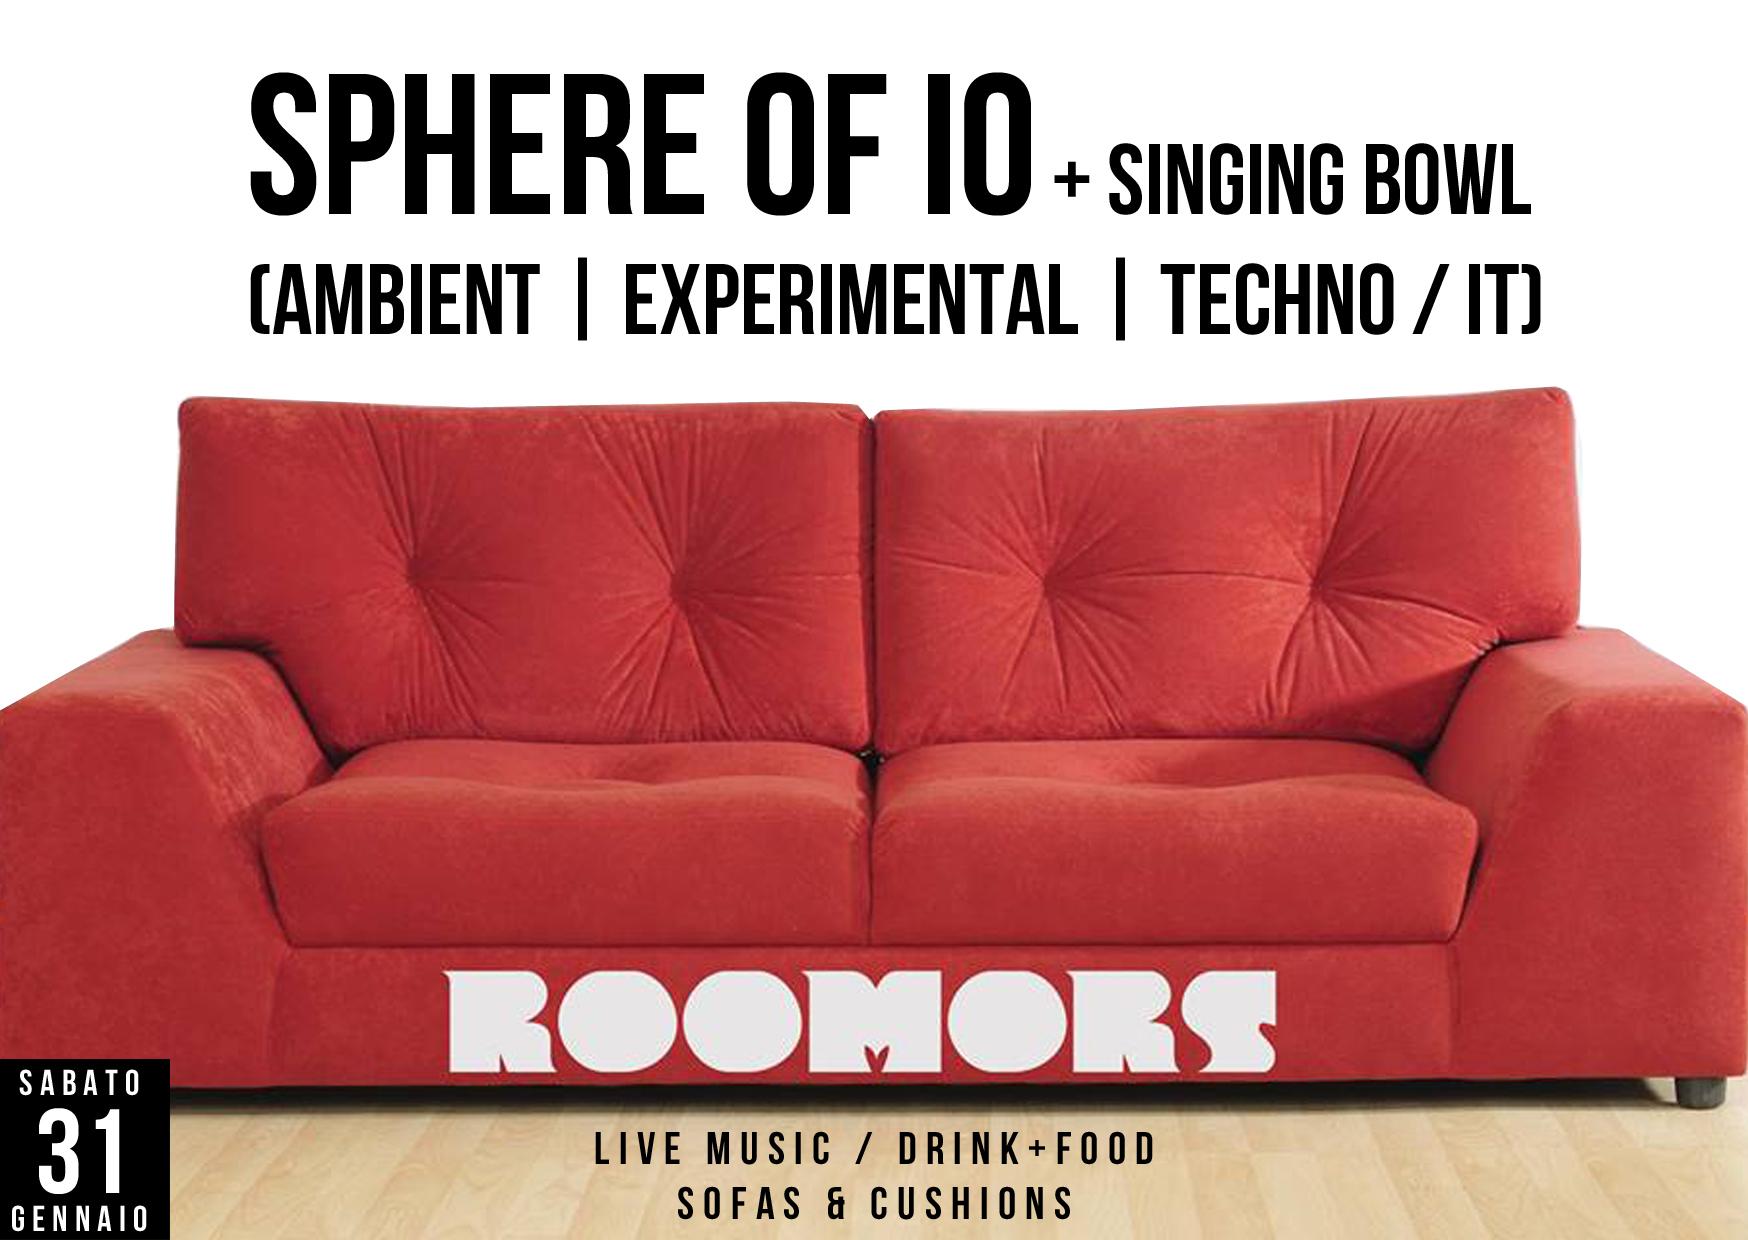 Roomors